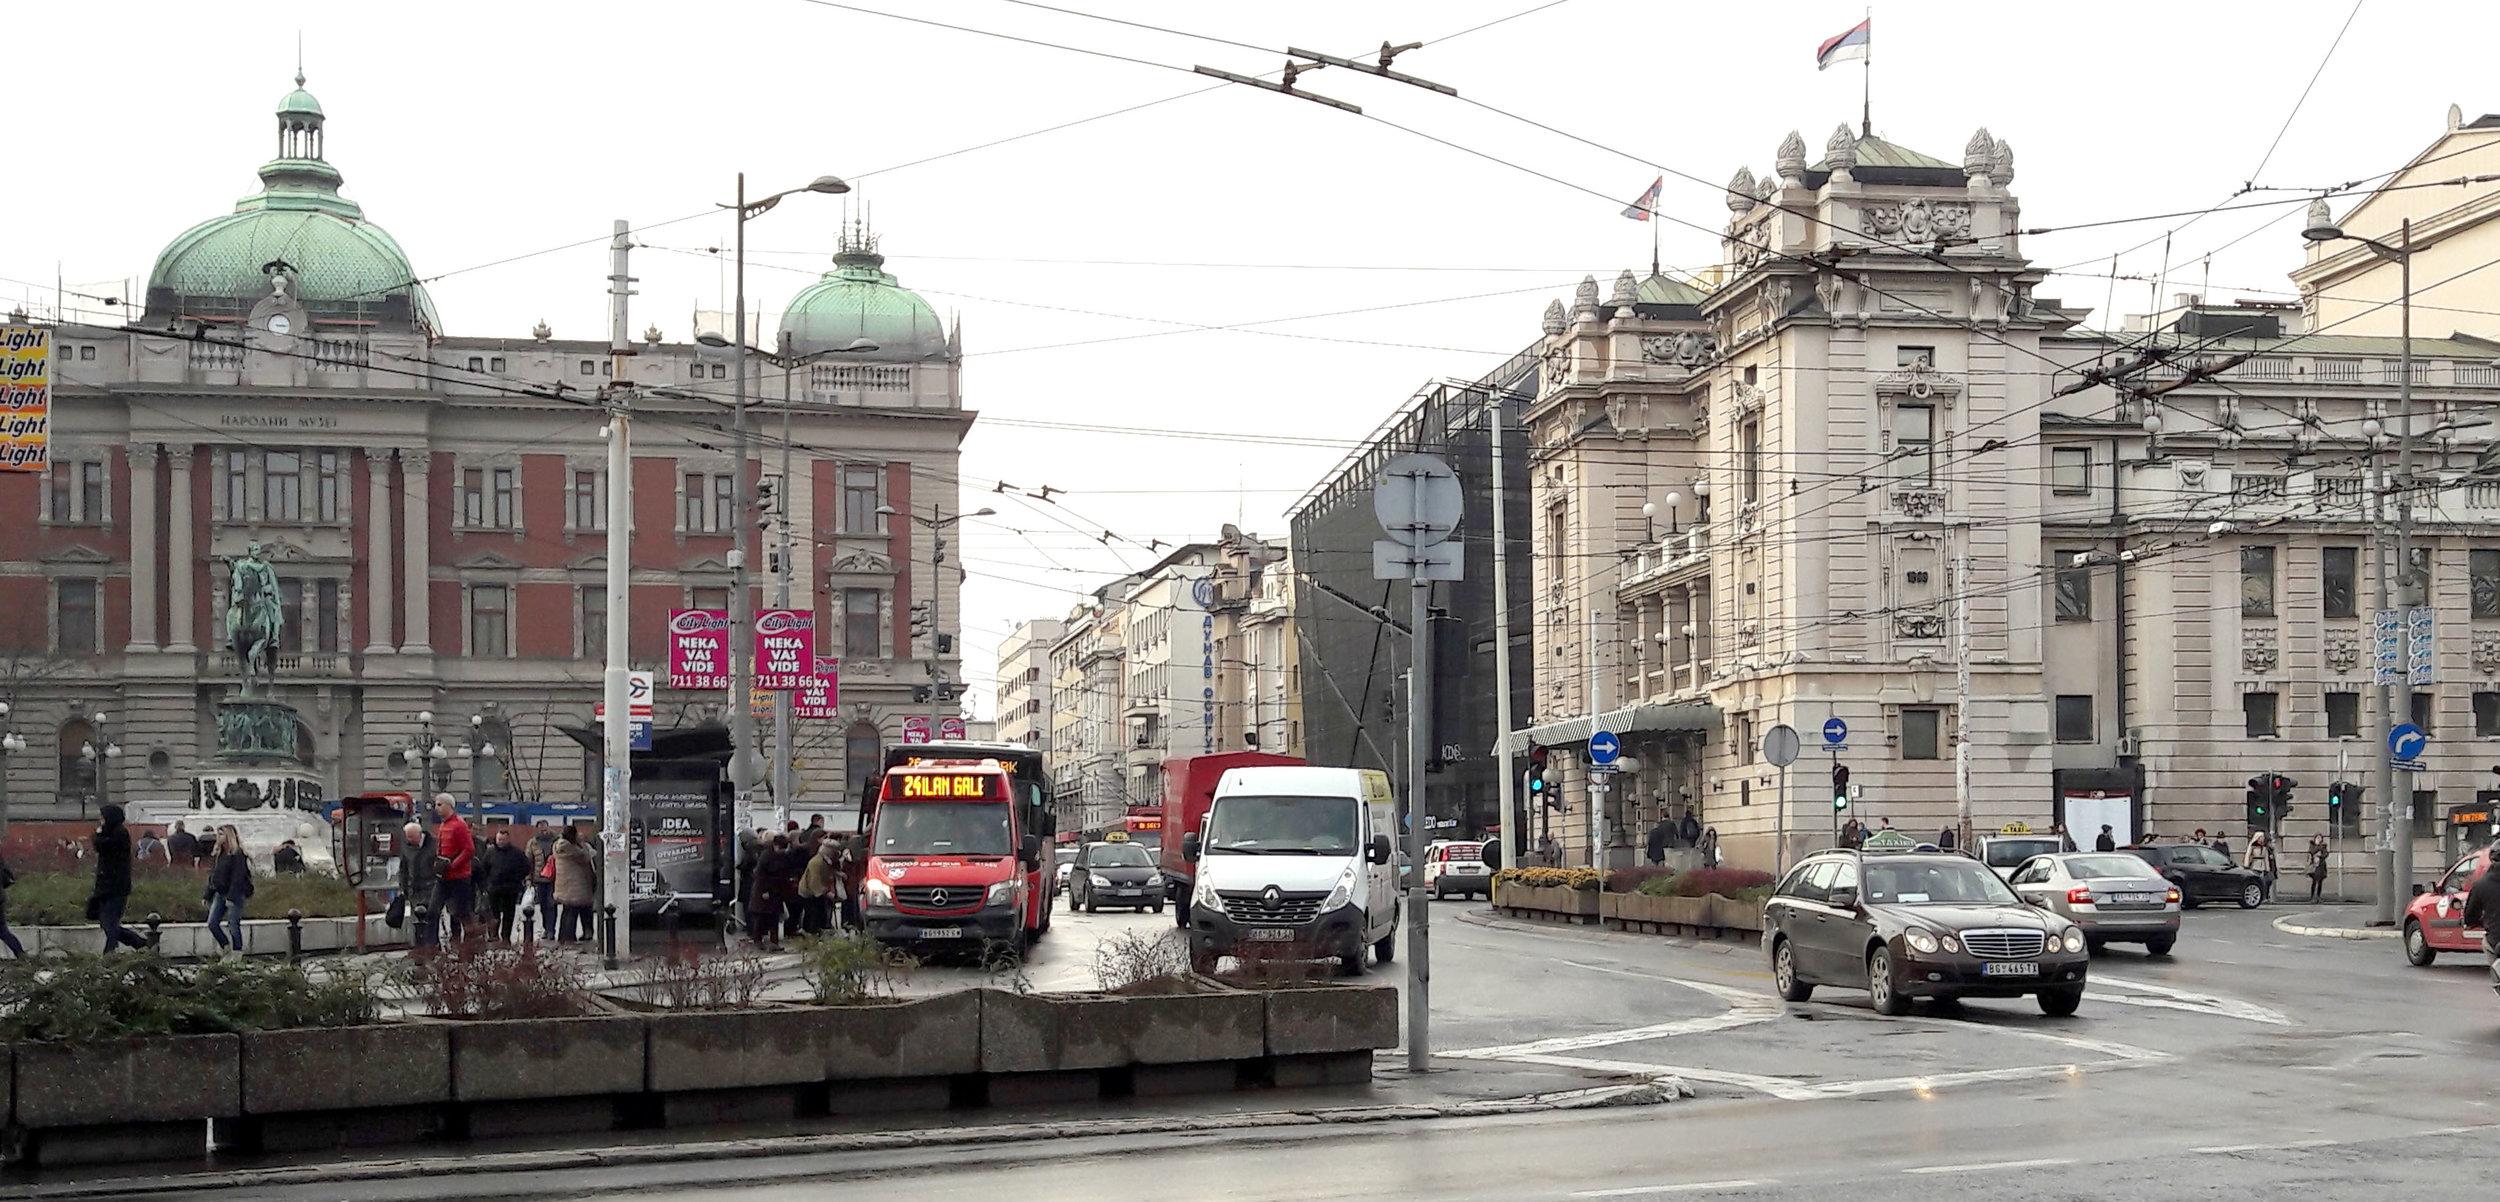 Narodno Pozorište, (National Theatre) on the right